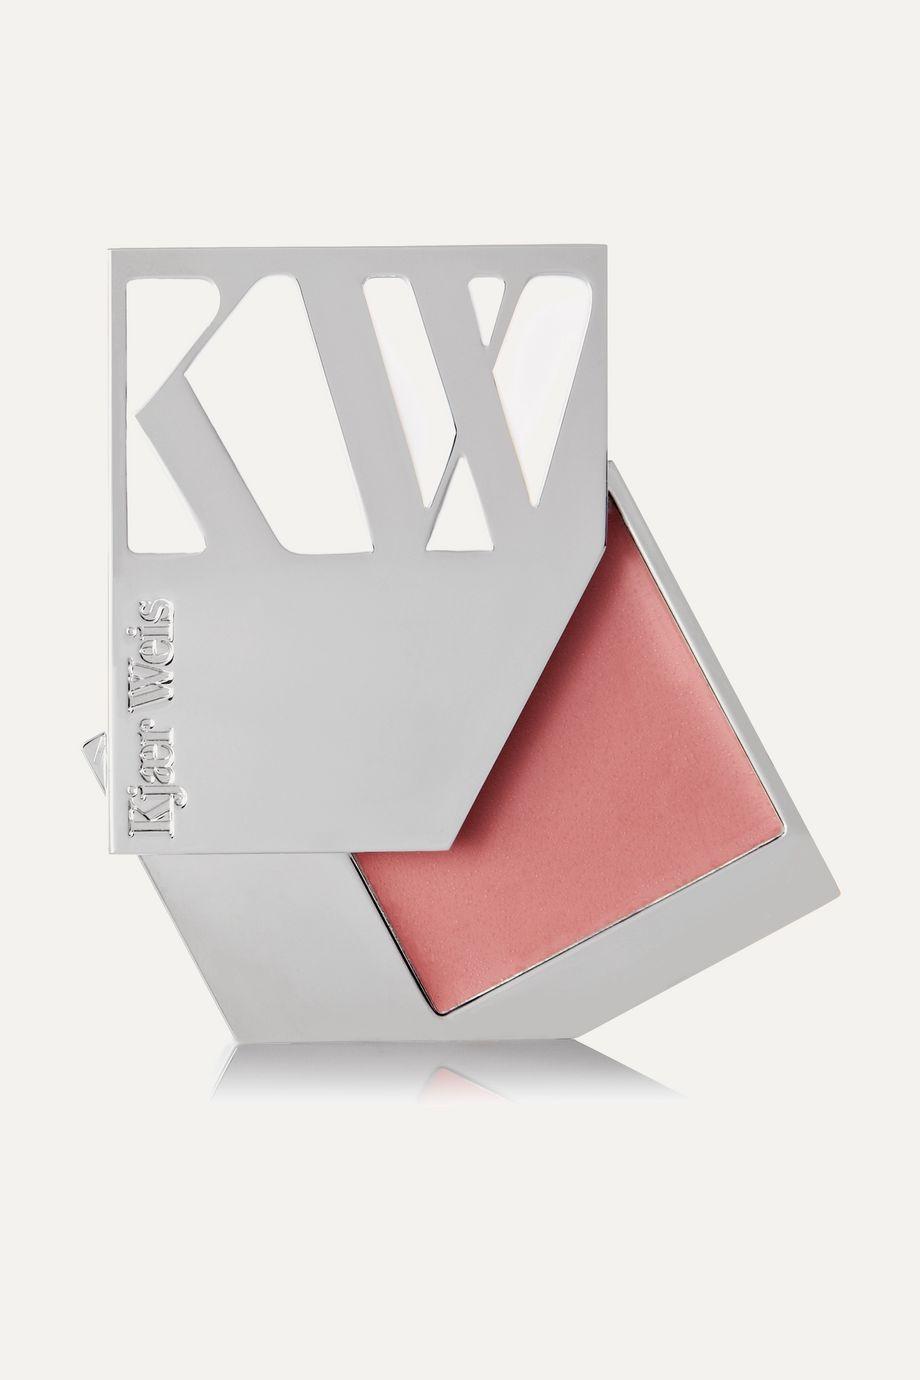 Kjaer Weis Cream Blush - Sun Touched